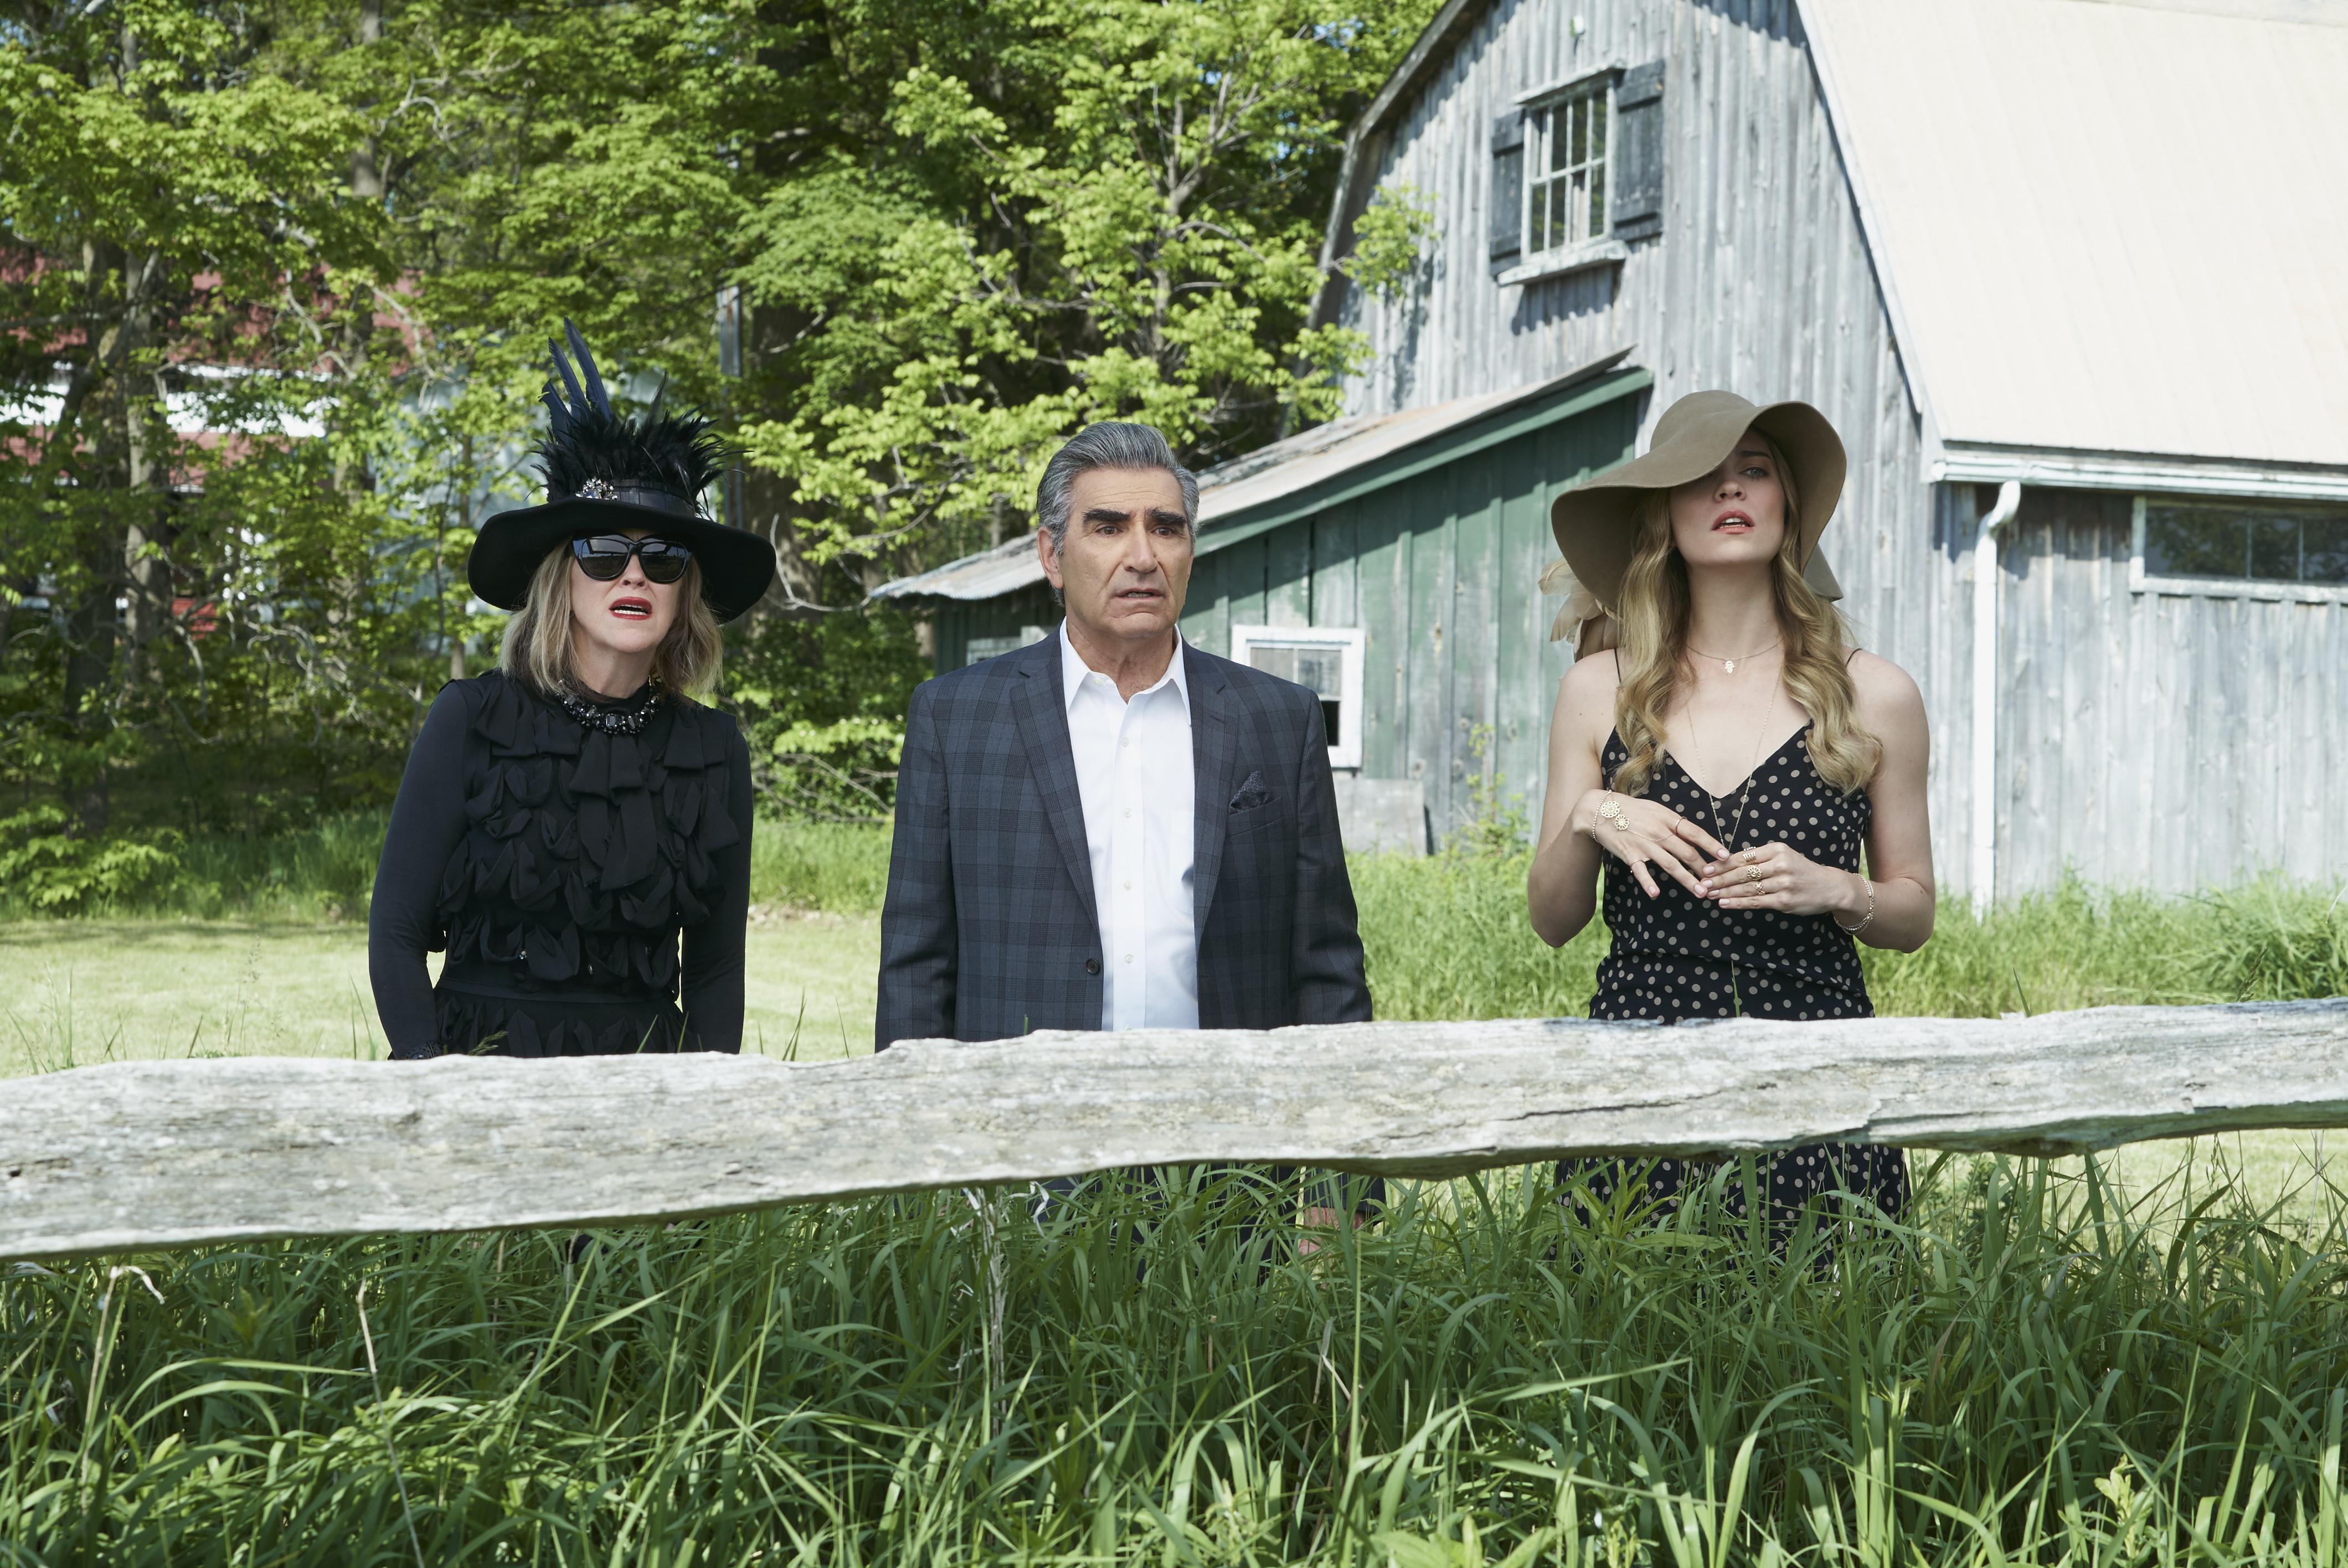 Schitt's Creek: Season Three of Pop Comedy Series Coming in